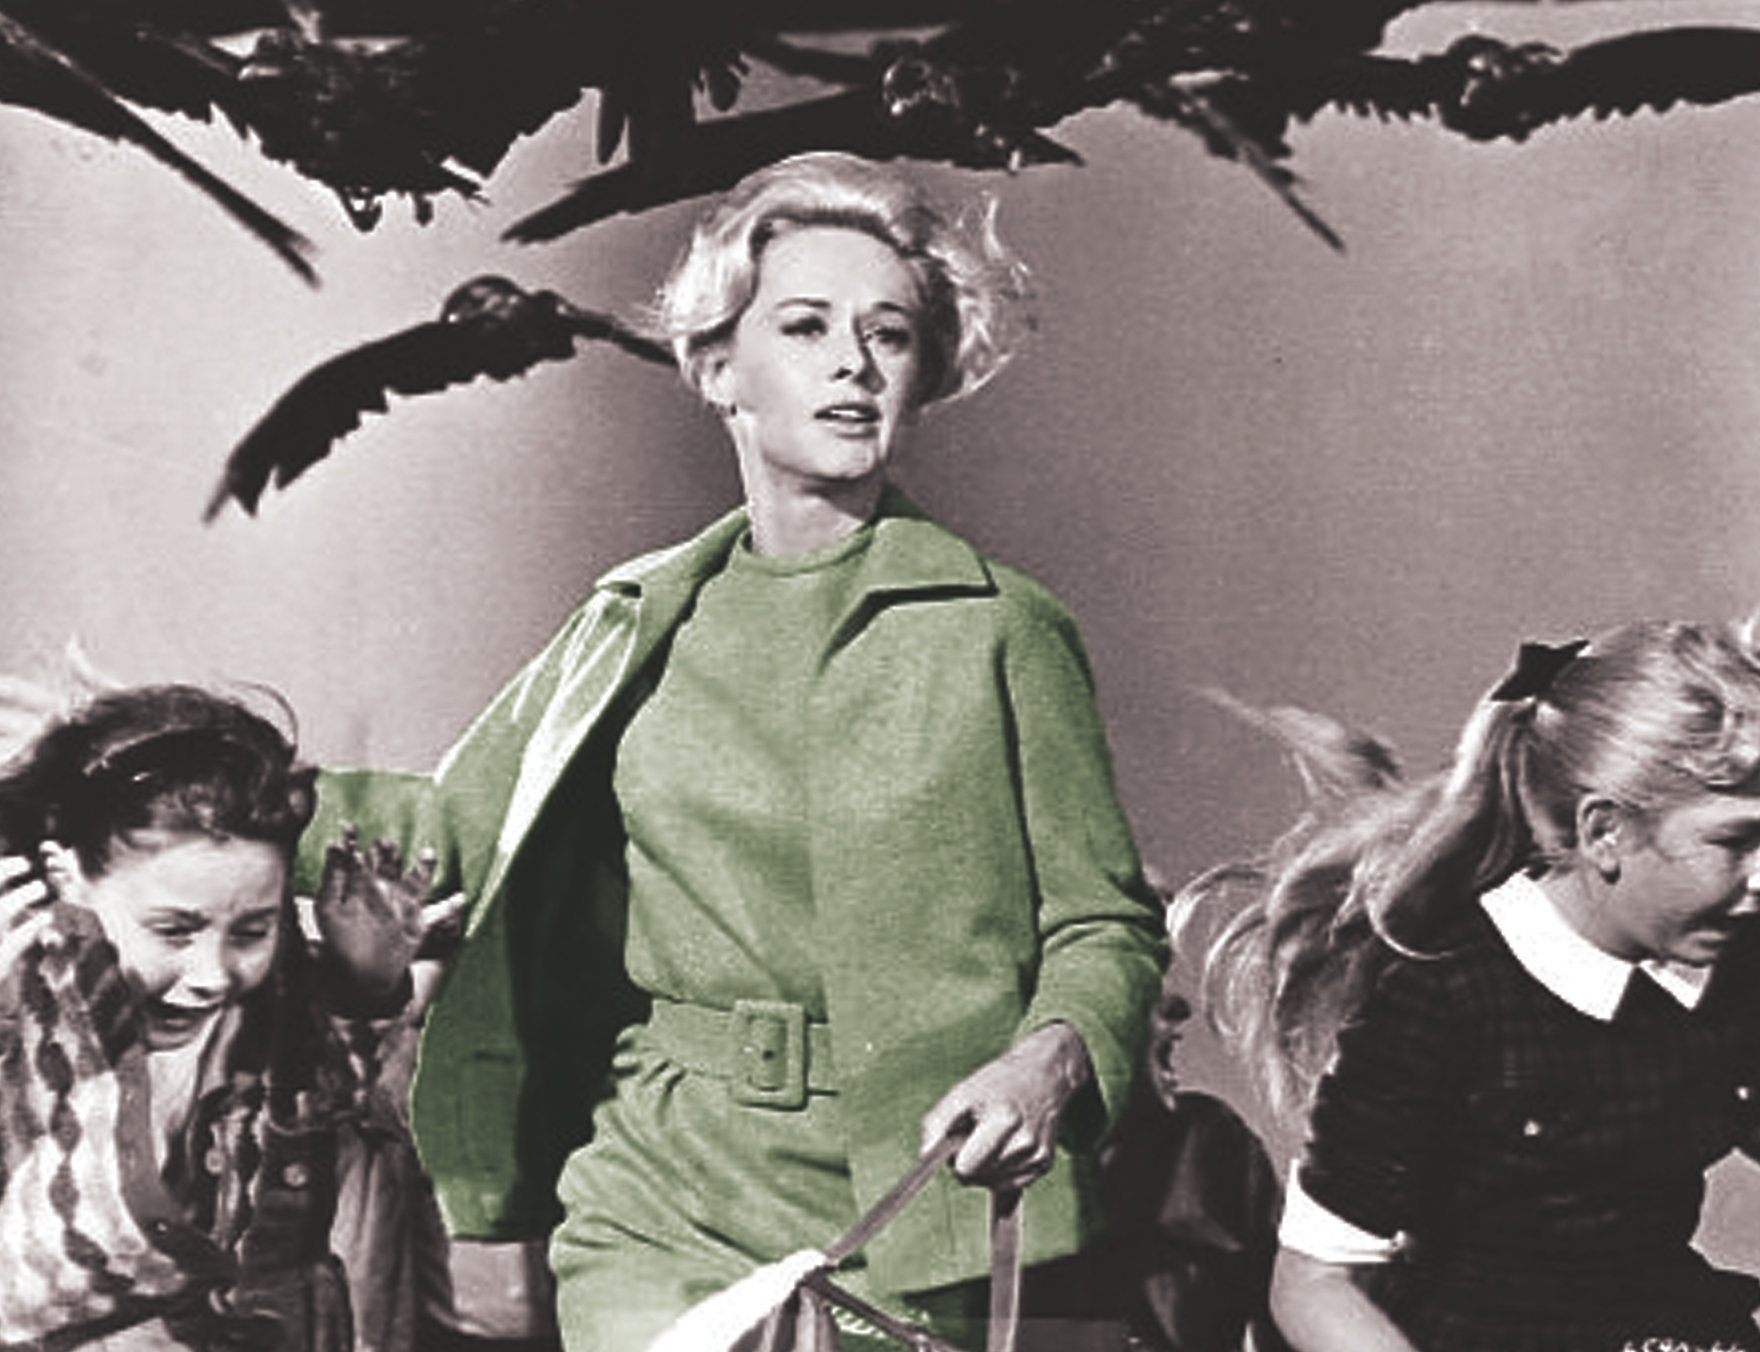 Tippi Hedren & The Birds